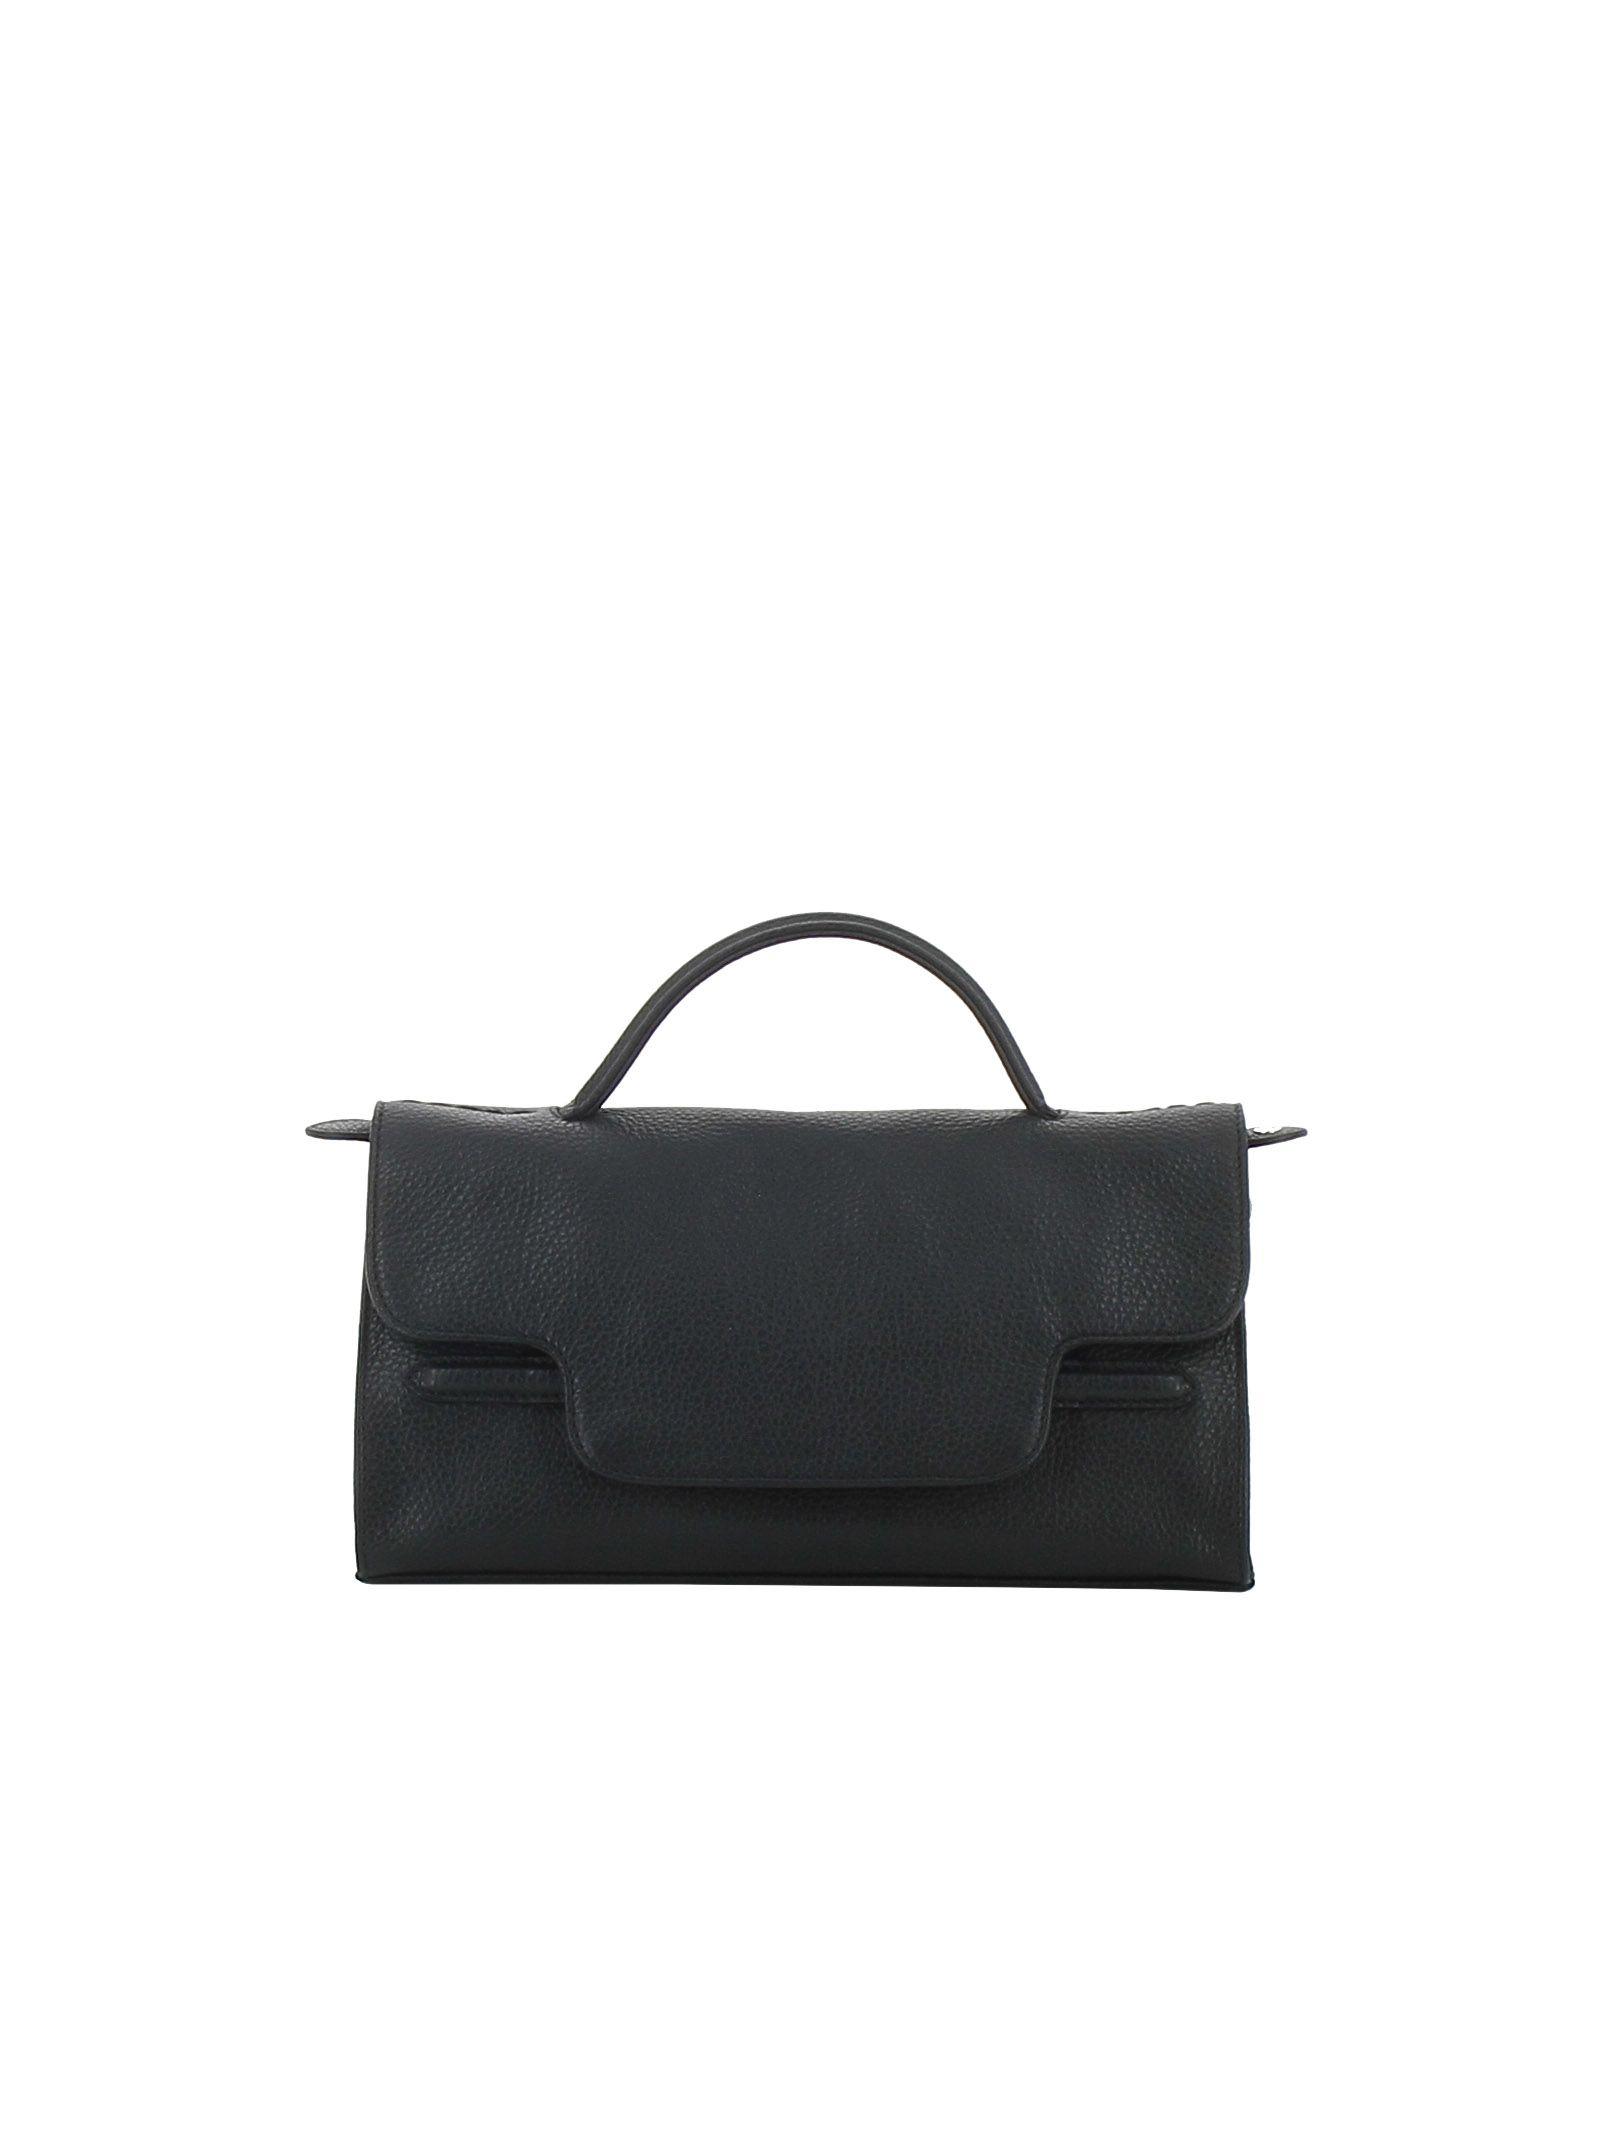 Zanellato Nina S Daily Shoulder Bag